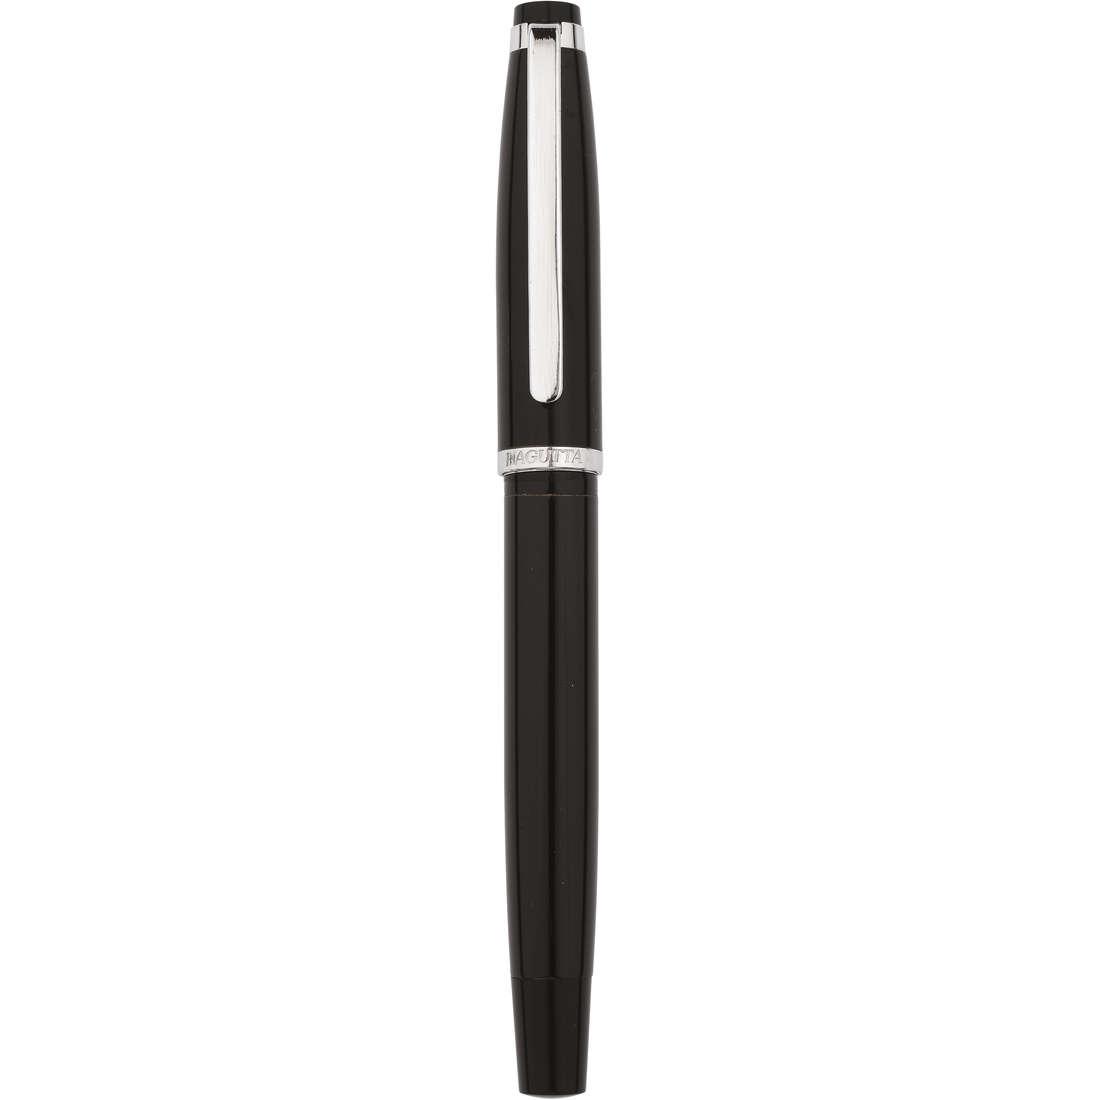 penna unisex gioielli Bagutta Penne H 6000-02 S